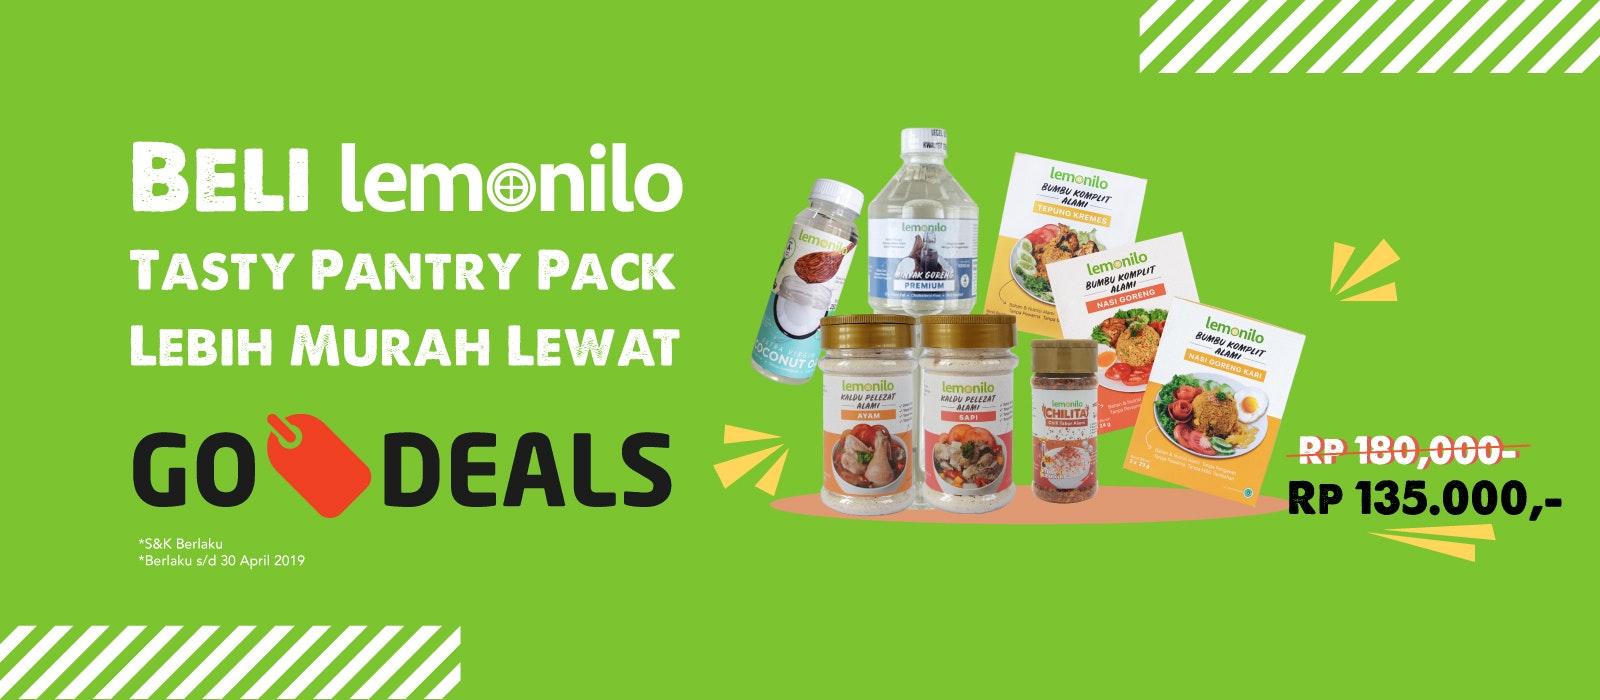 Lemonilo x Go-Deals